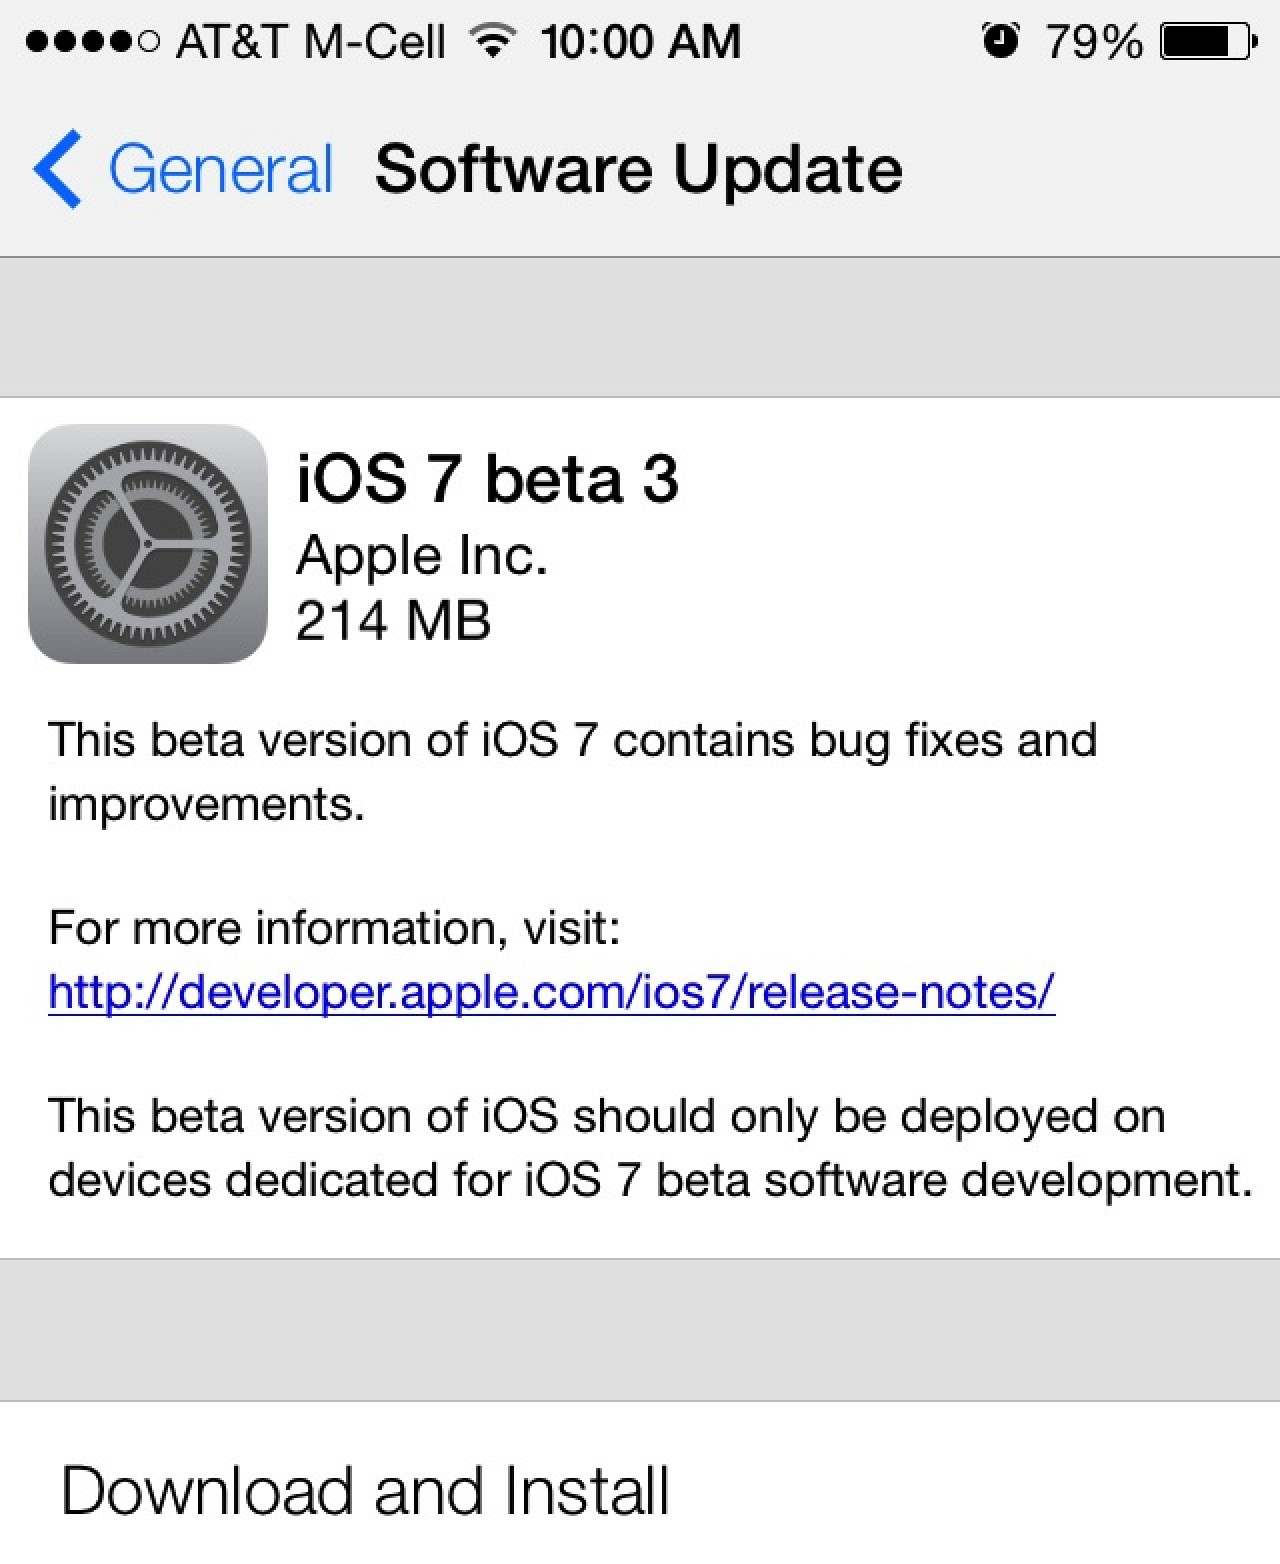 Apple Seeds iOS 7 Beta 3 to Developers - MacRumors